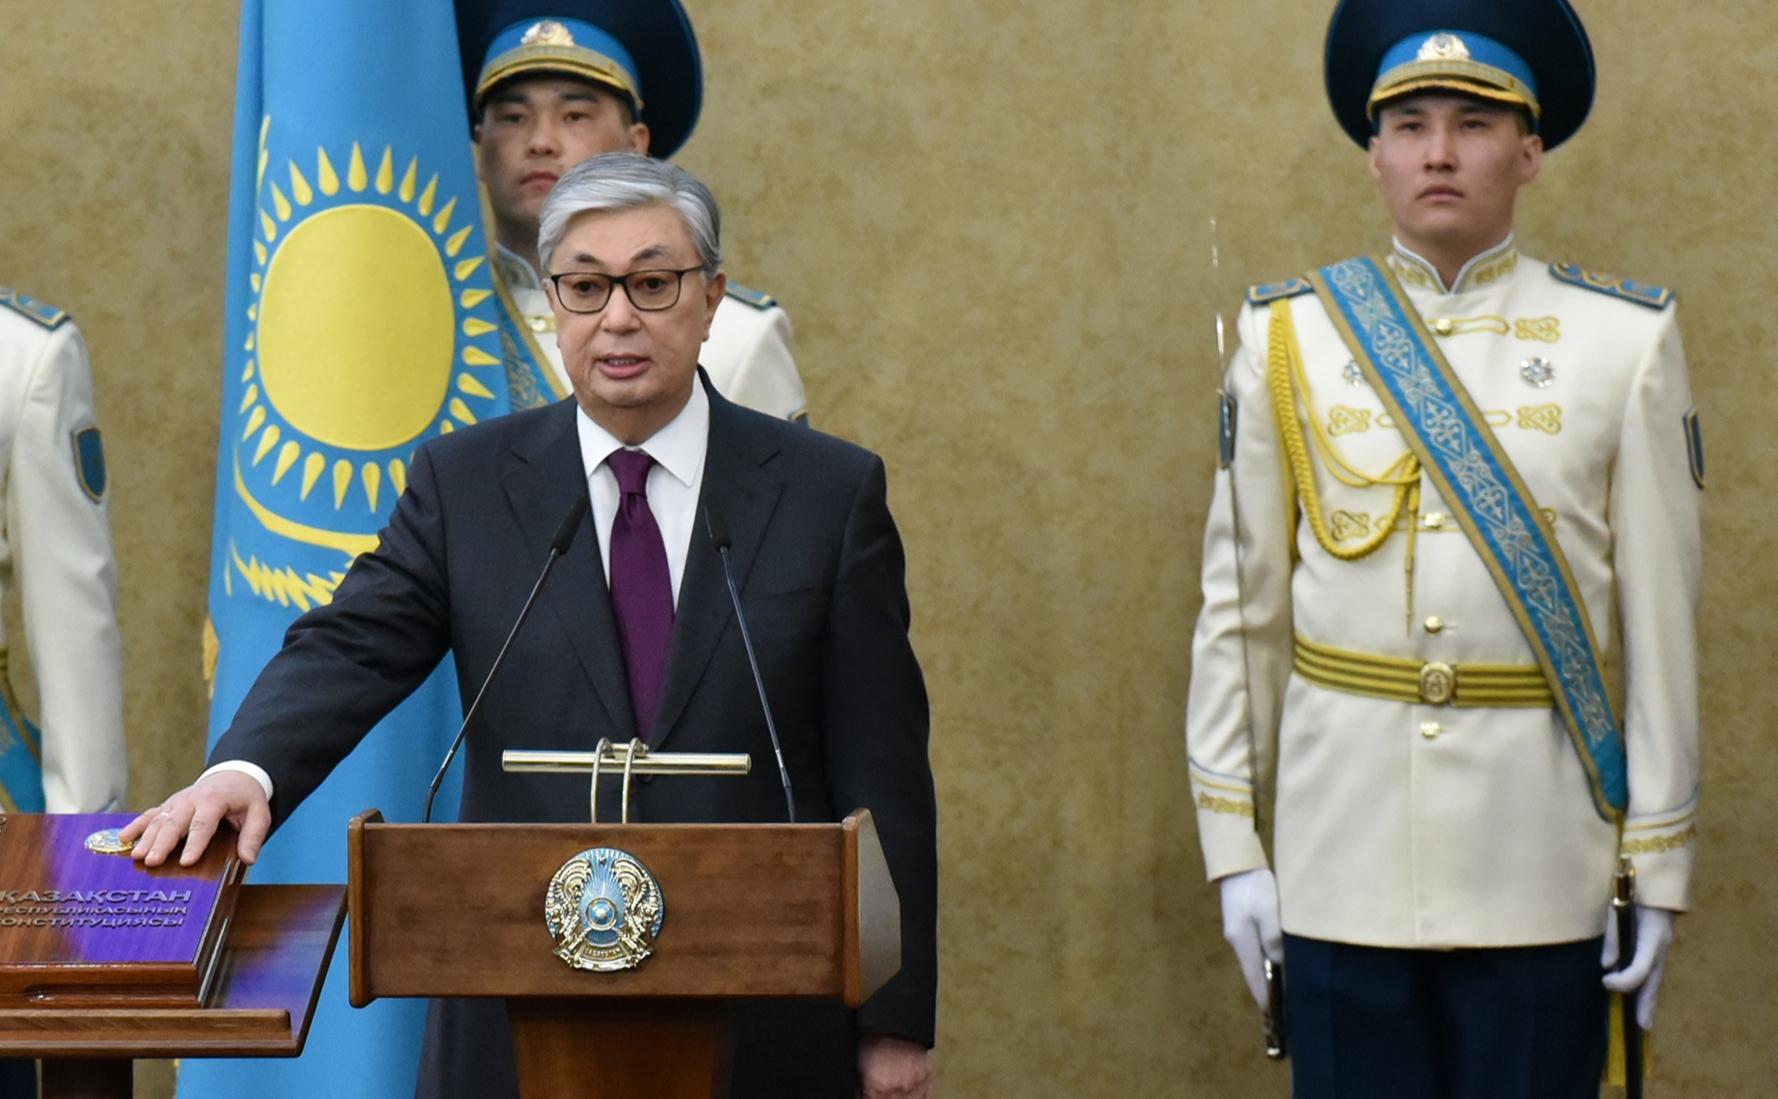 Фото: Владислав Воднев / РИА Новости